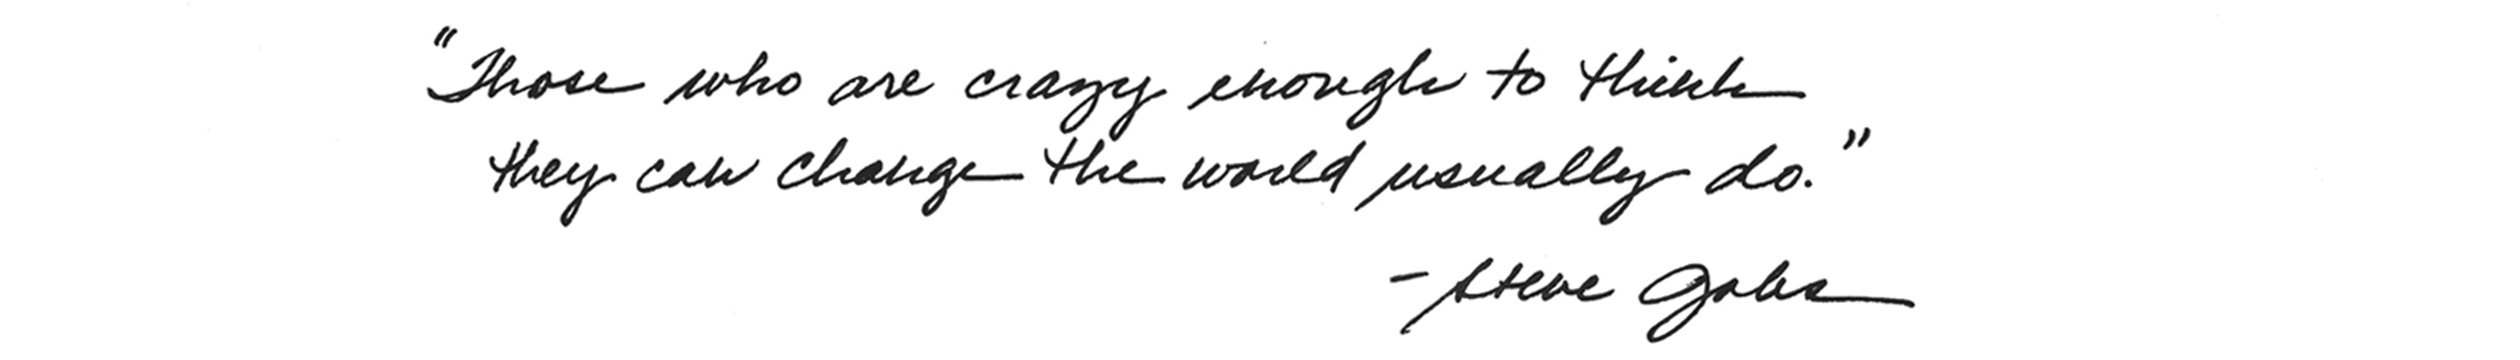 Stillness-Fiji-Steve-Jobs-quote